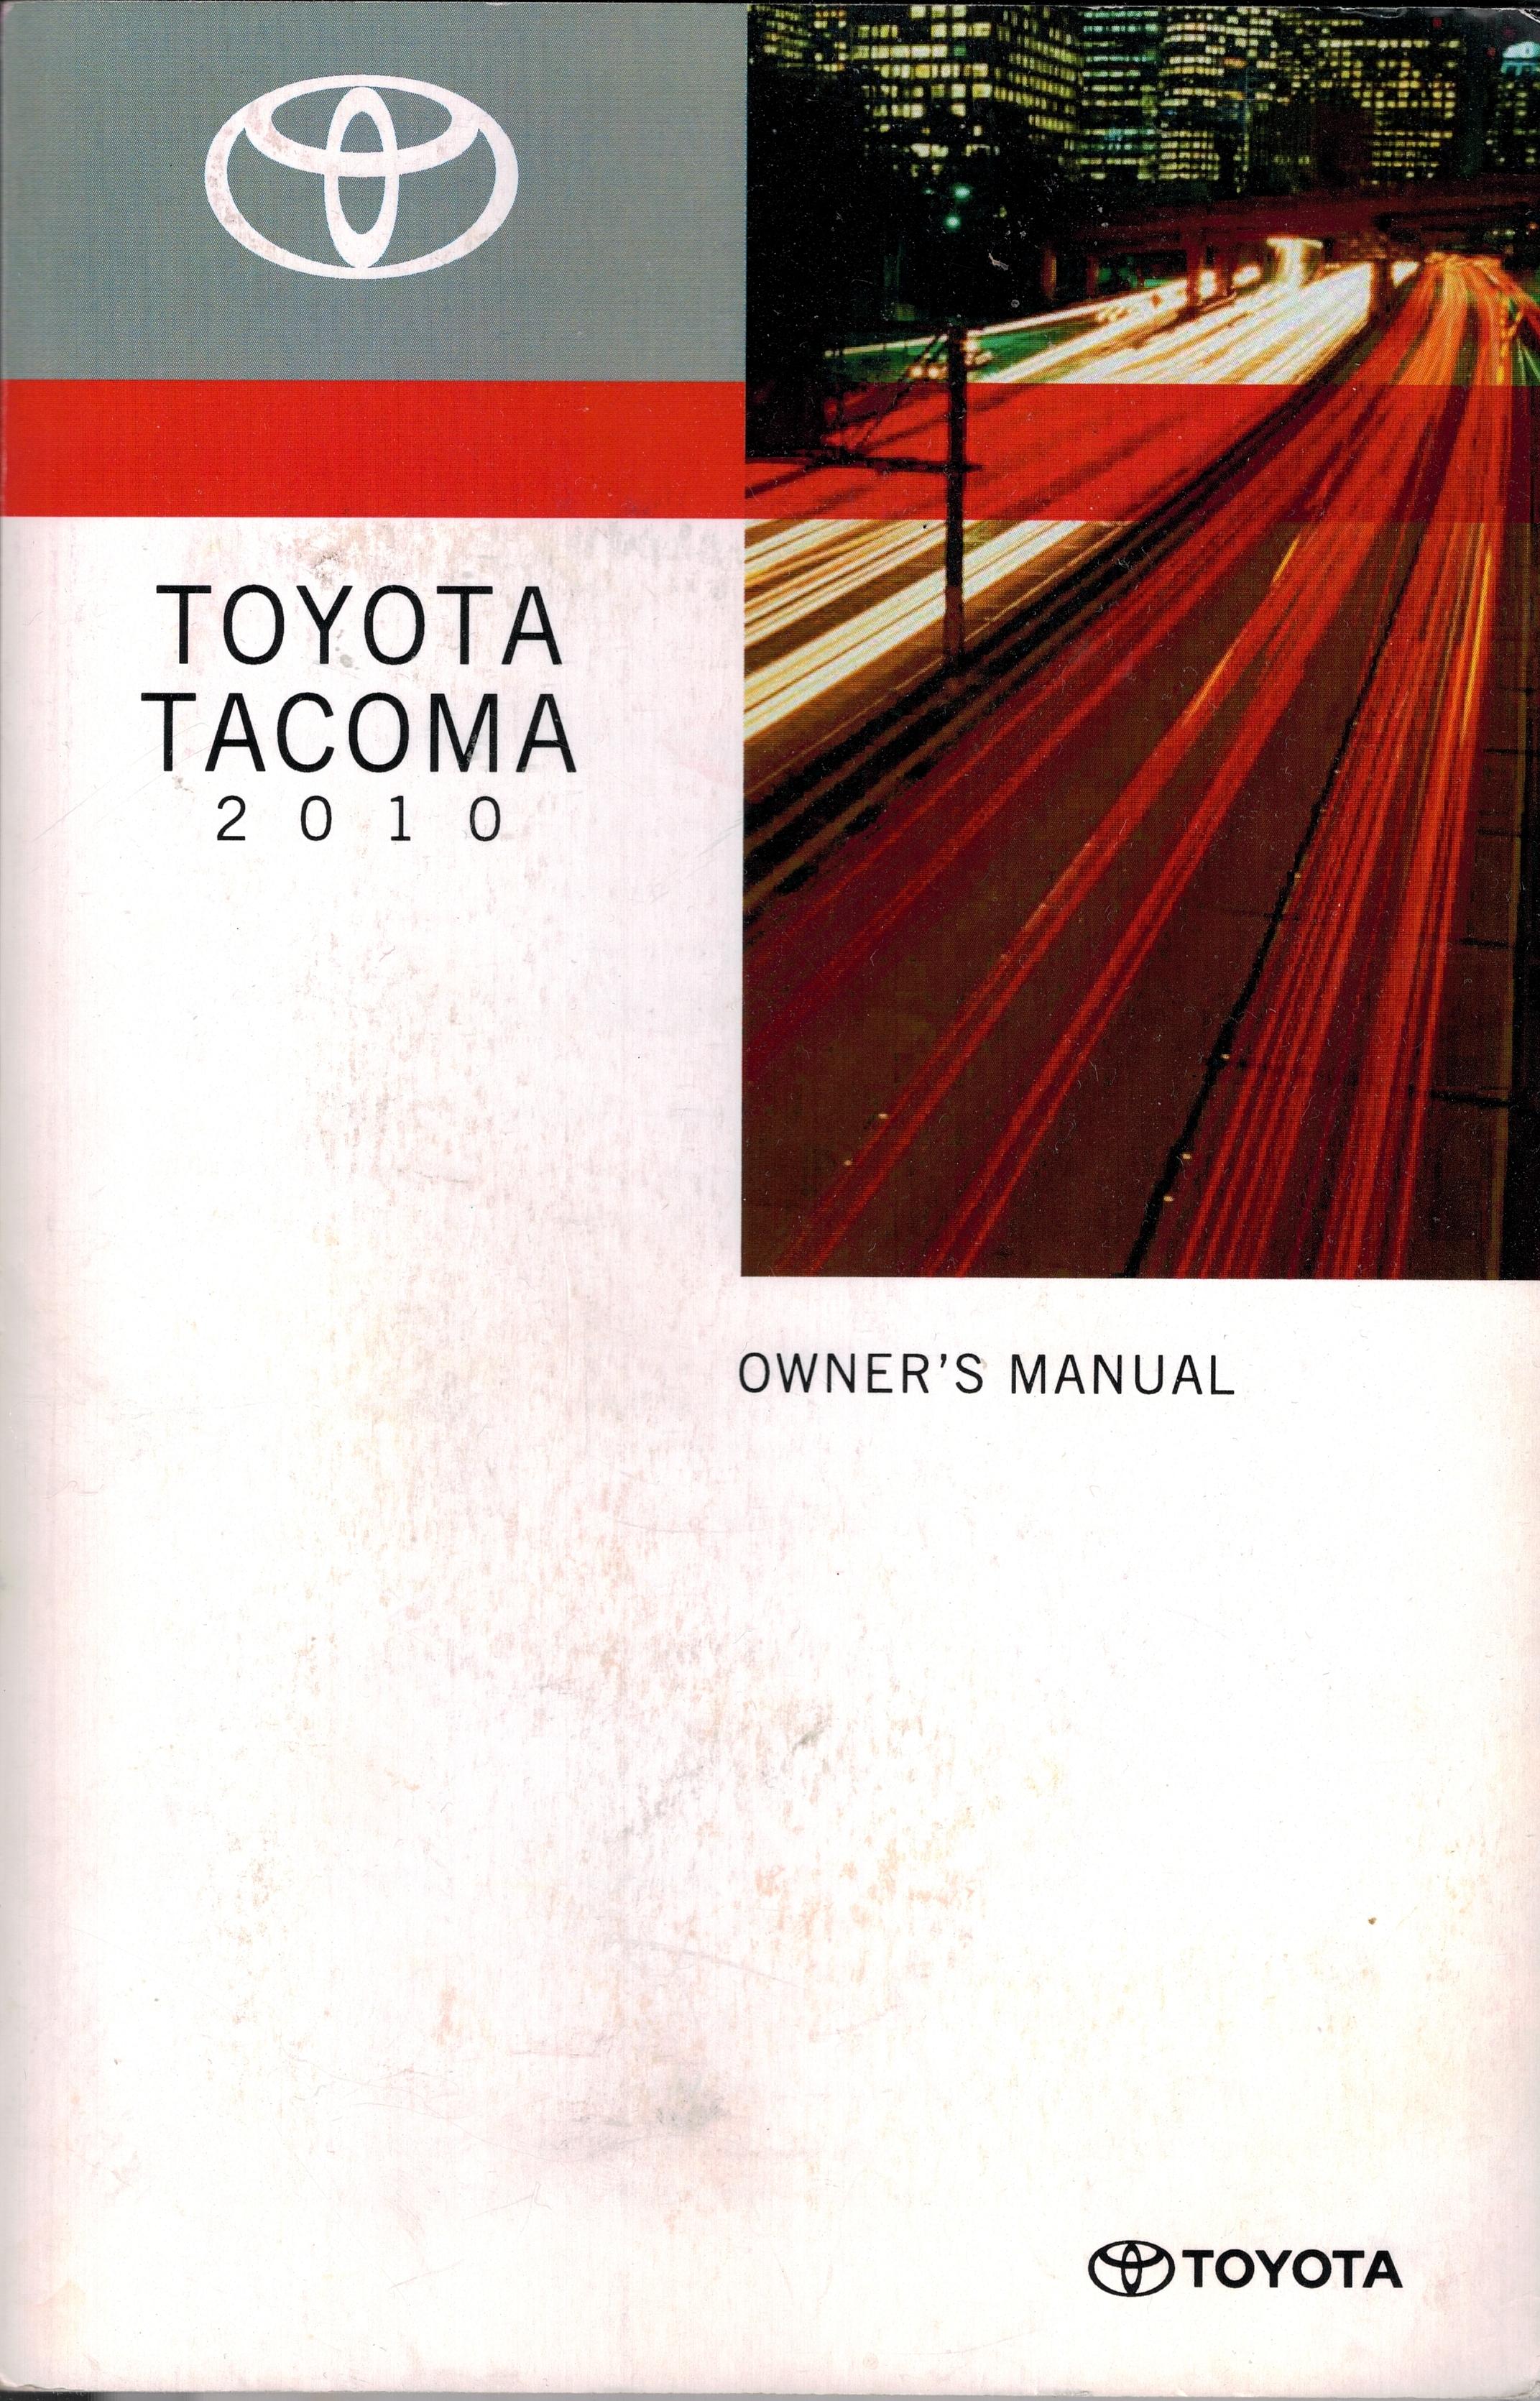 Toyota Tacoma 2010 Owners Manual